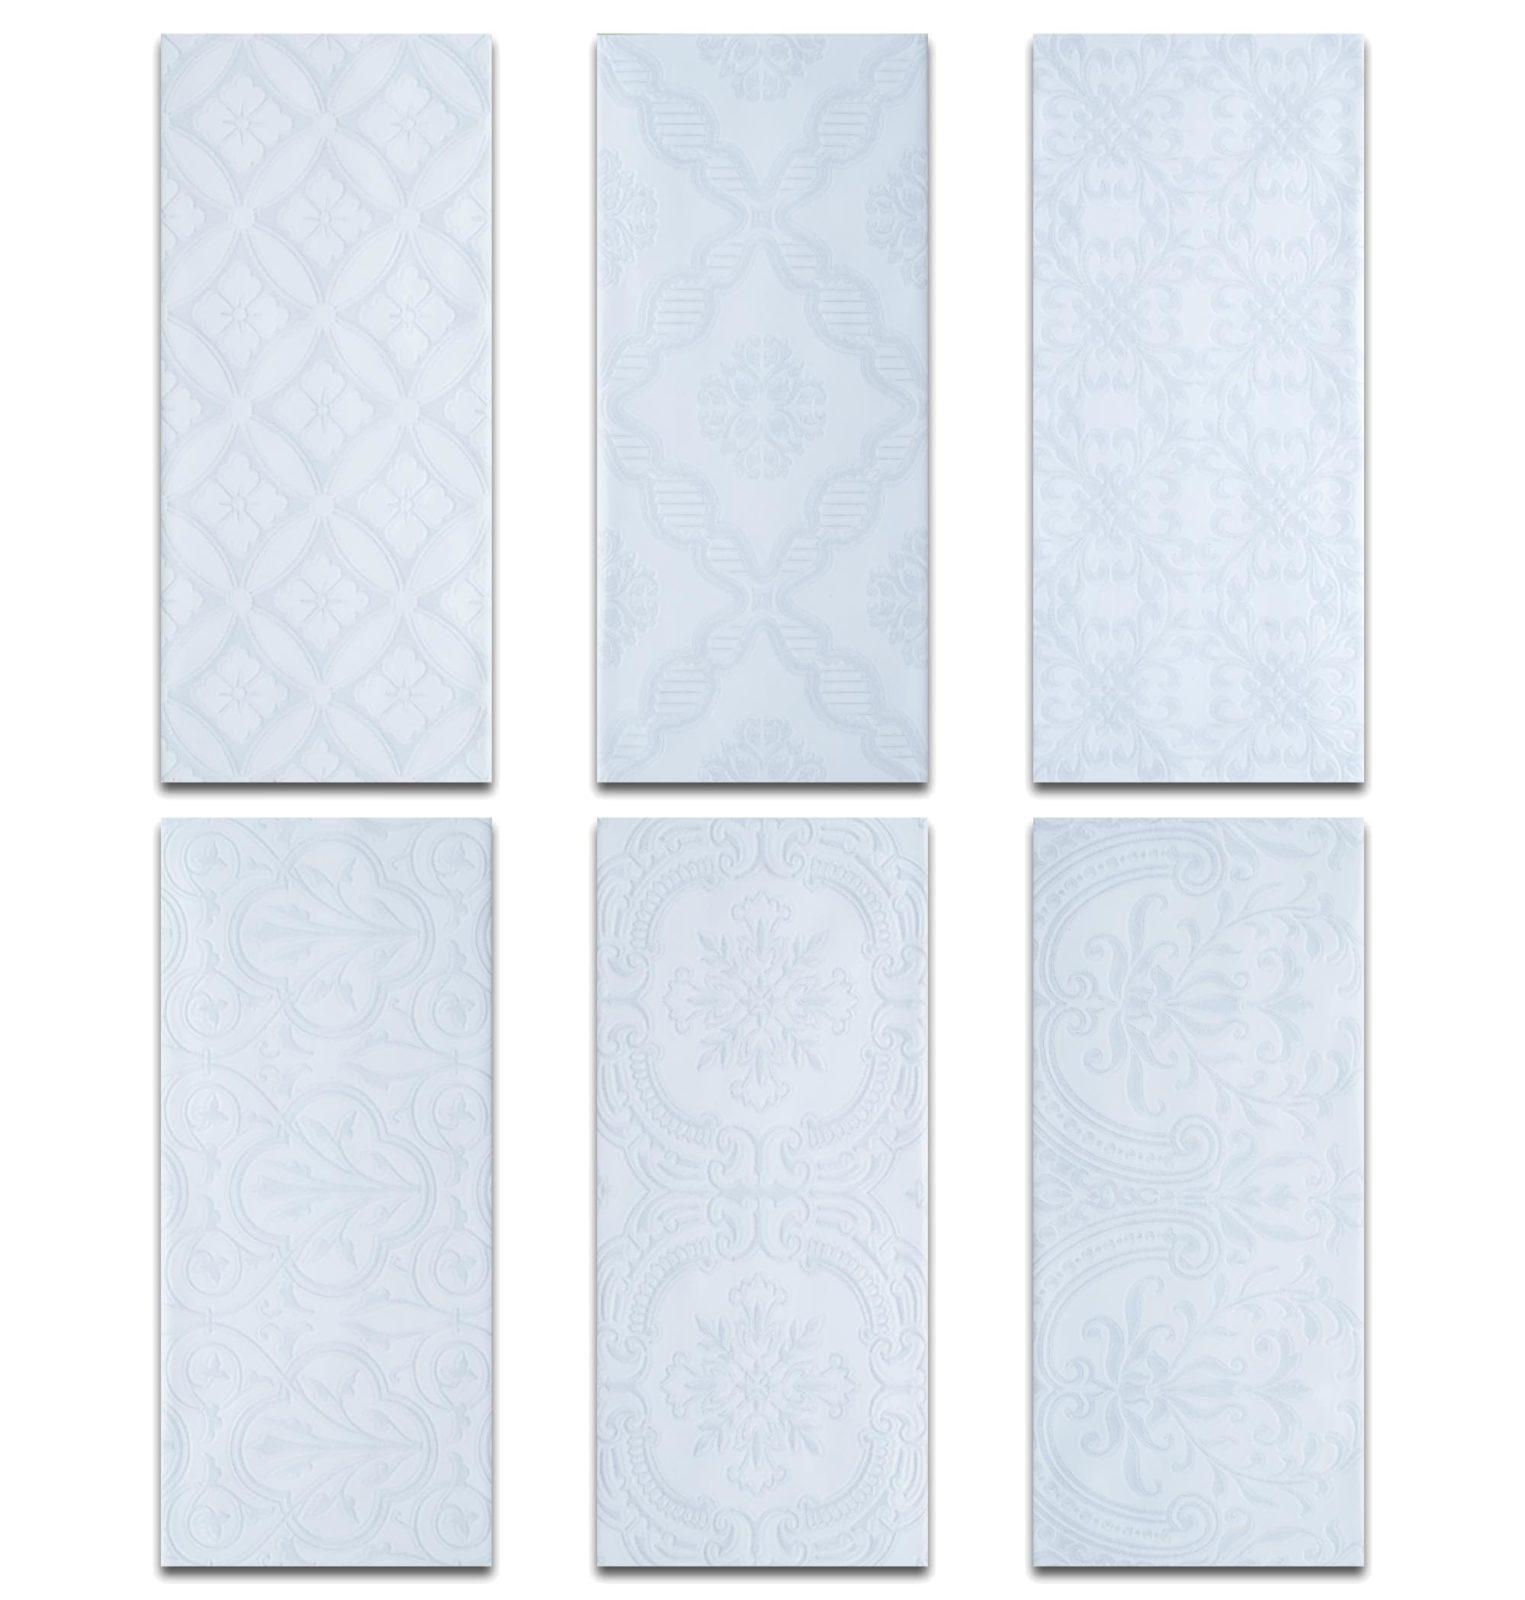 Roca Maiolica Decorative White Ceramic Tile 4 X